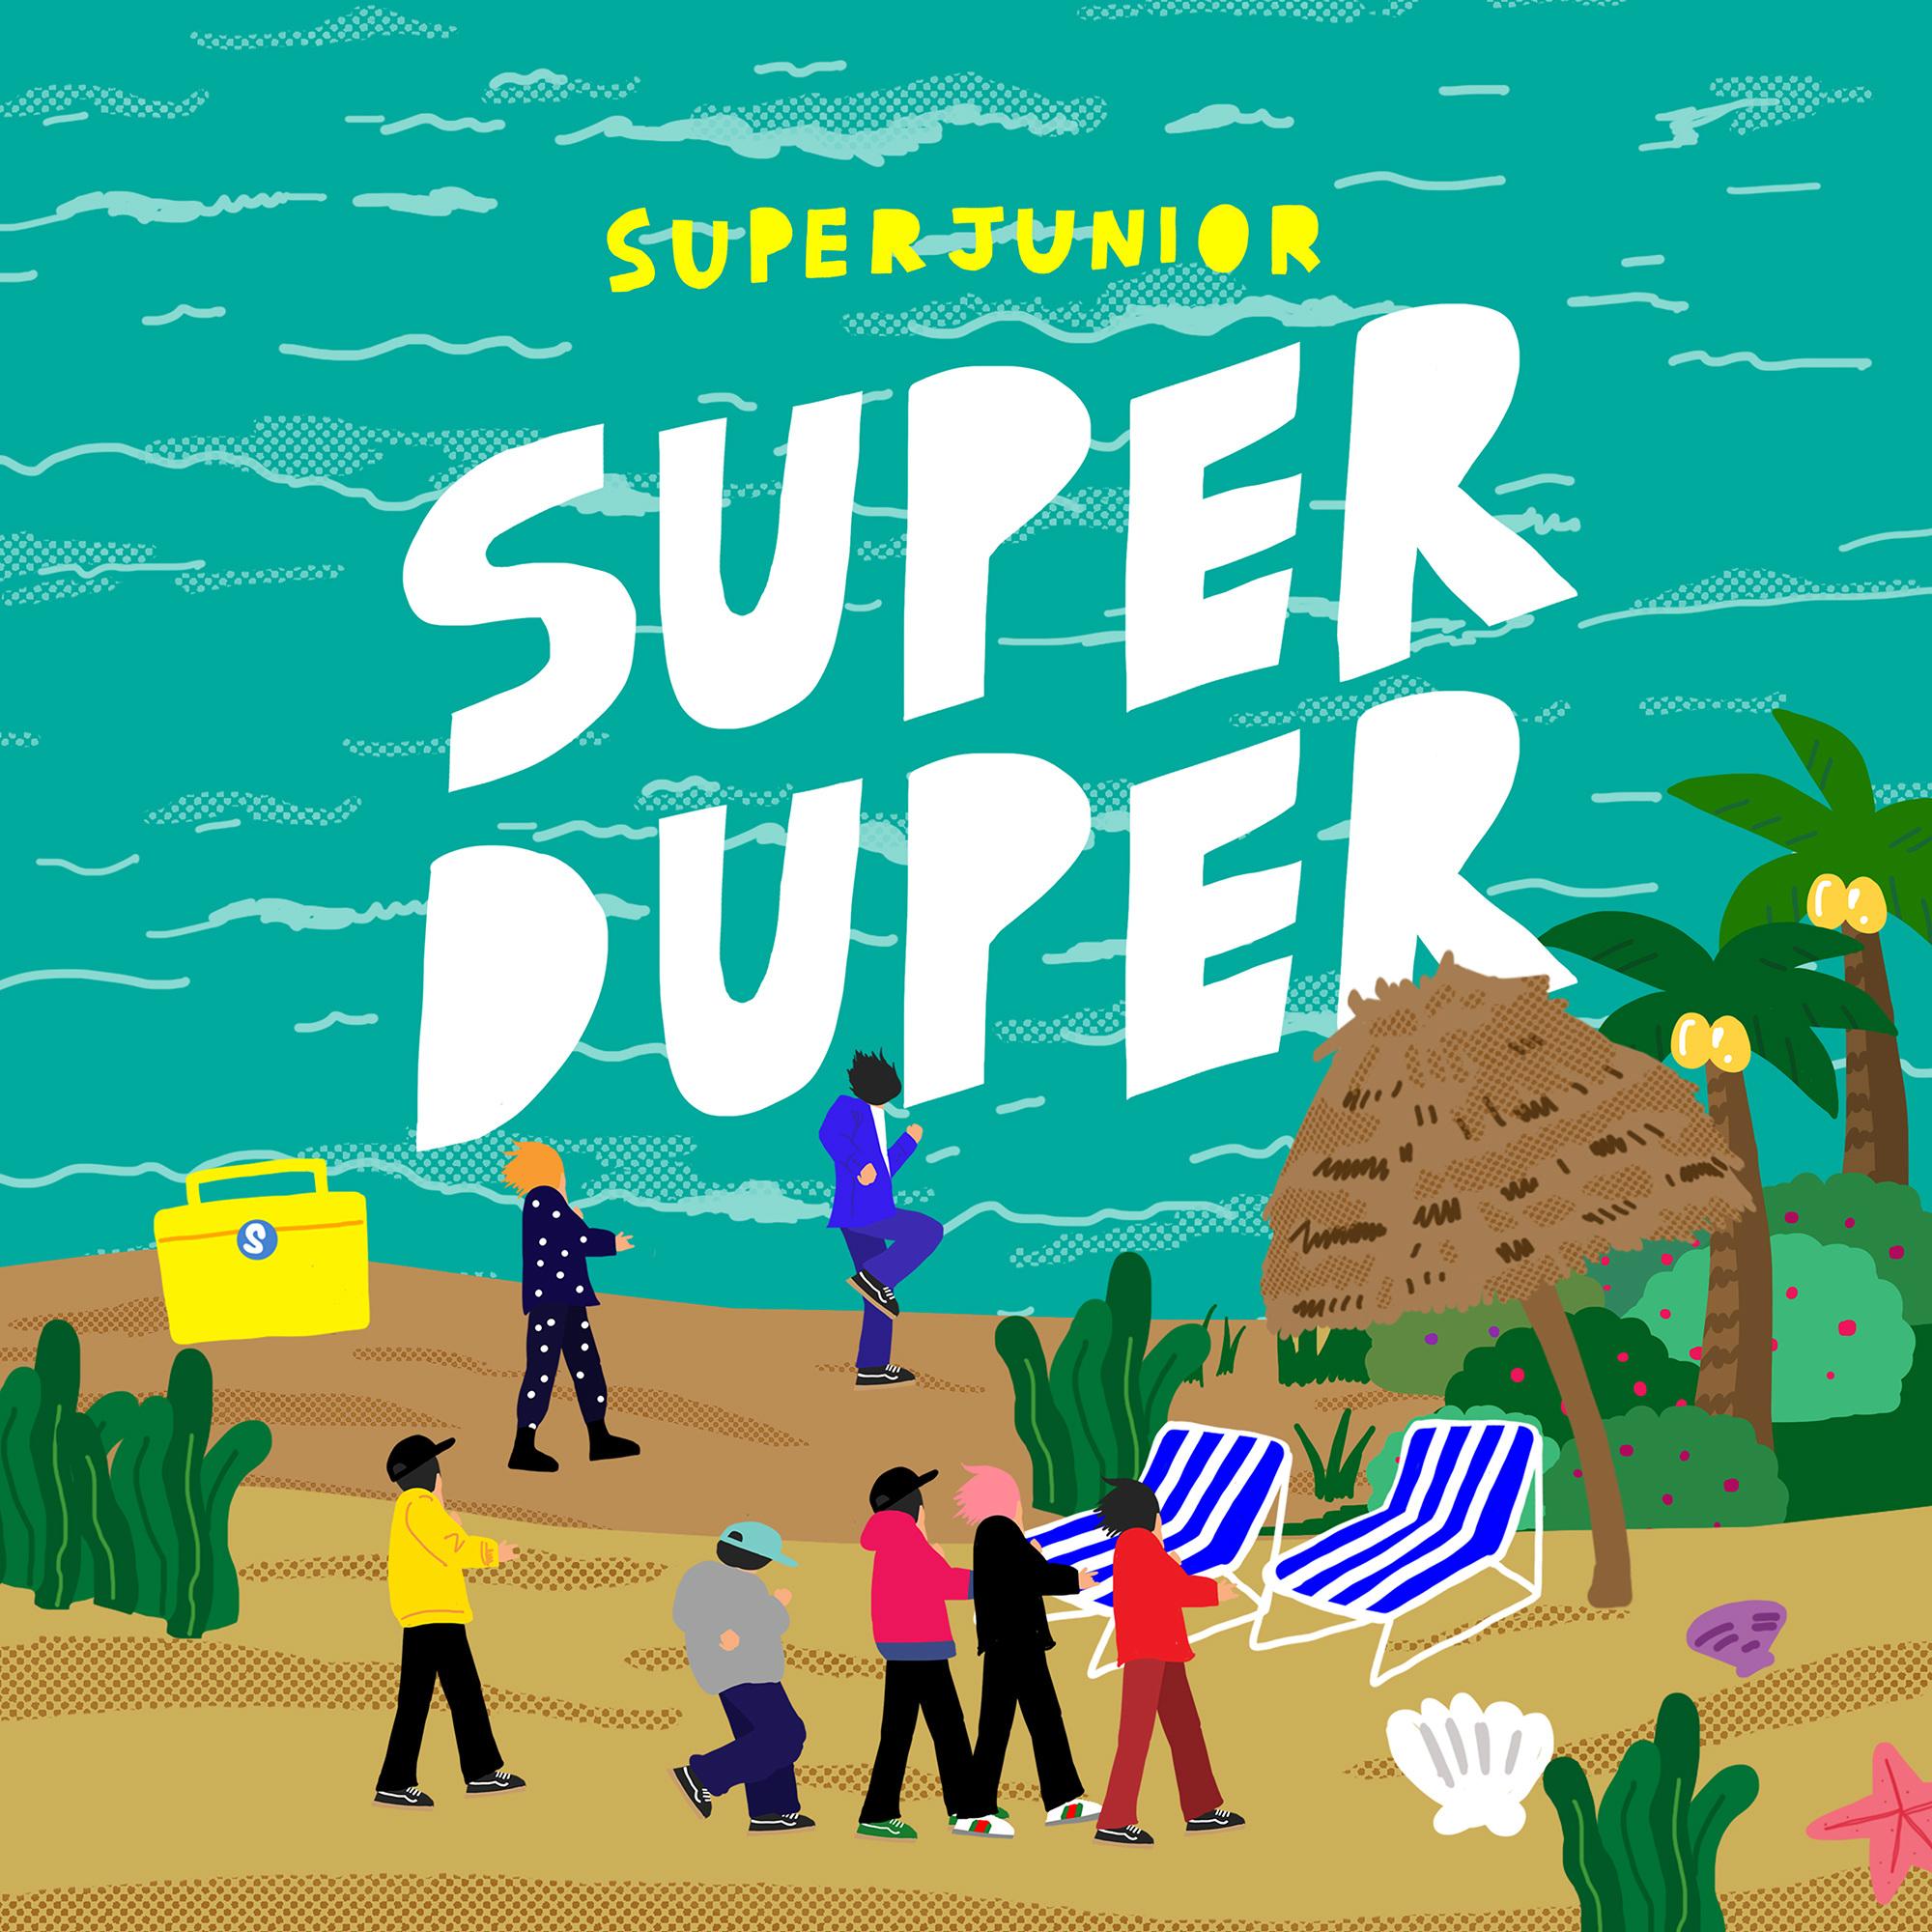 Super Junior正规8辑后续专辑先公开曲 3月23号下午公开